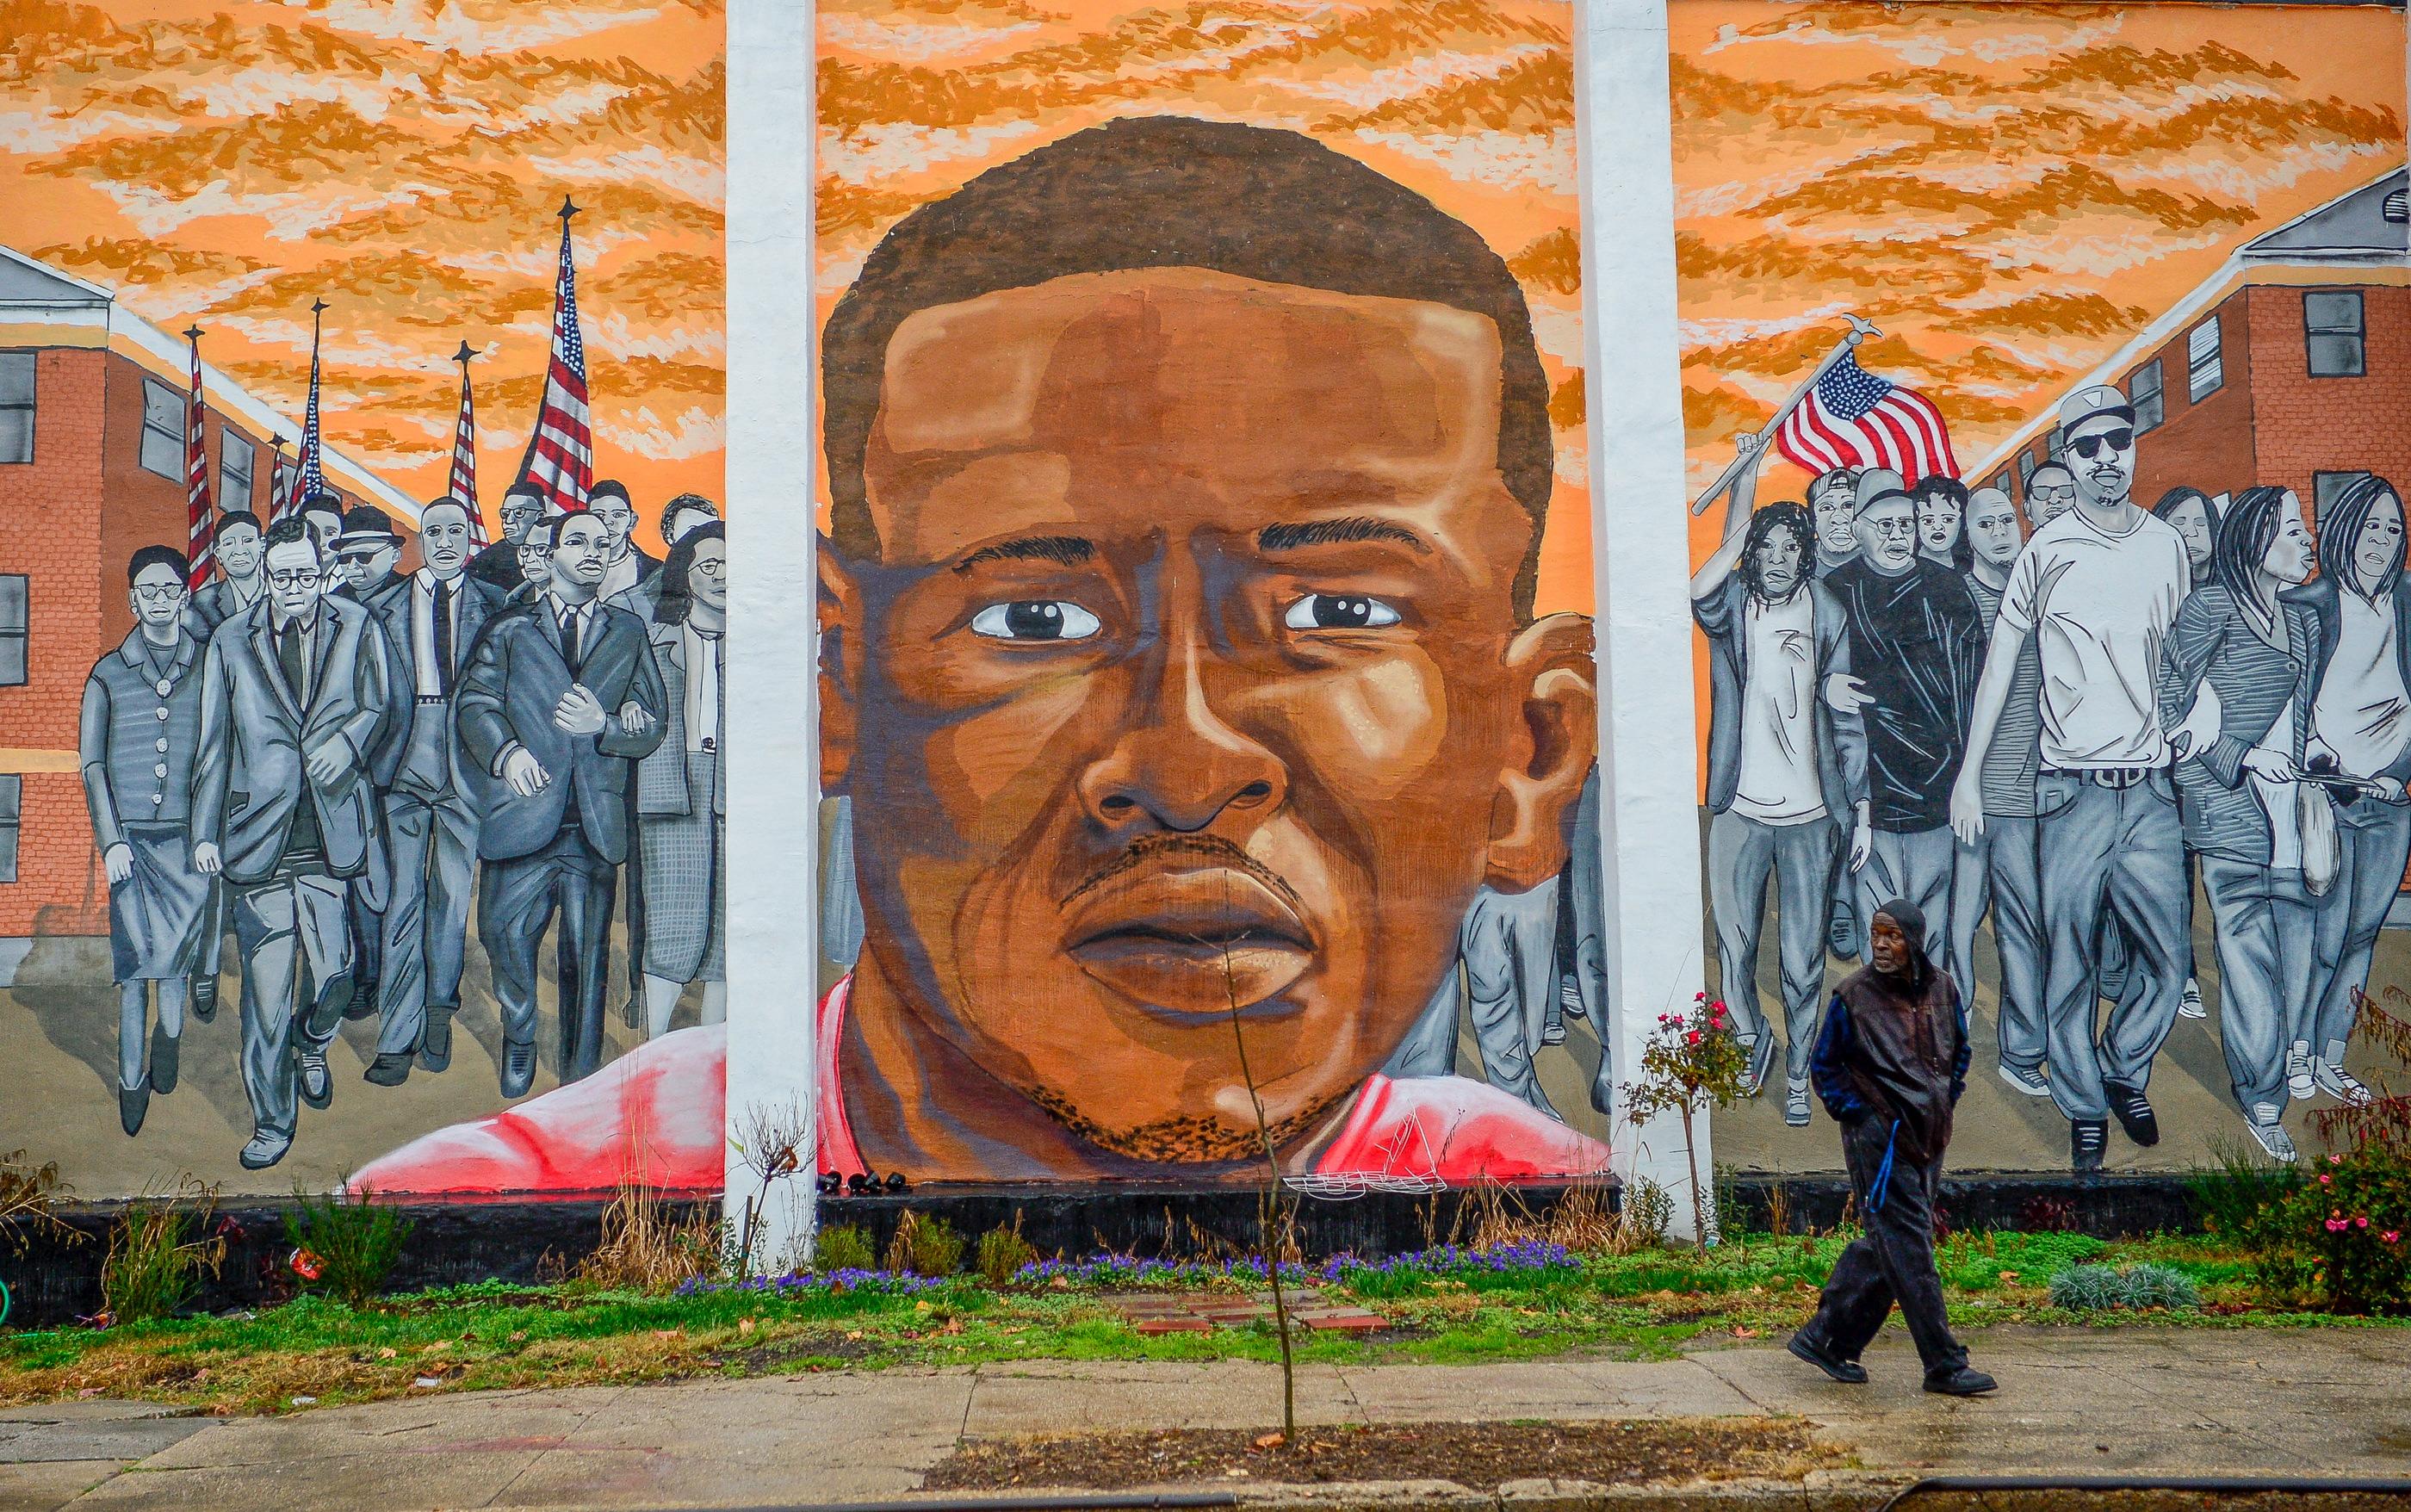 Freddie Gray, Marilyn Mosby, Criminal Justice, Criminal Justice Reform, Baltimore Unrest, Baltimore, African American Lives, Black Lives, Black Lives Matter, #BLM, KOLUMN Magazine, KOLUMN